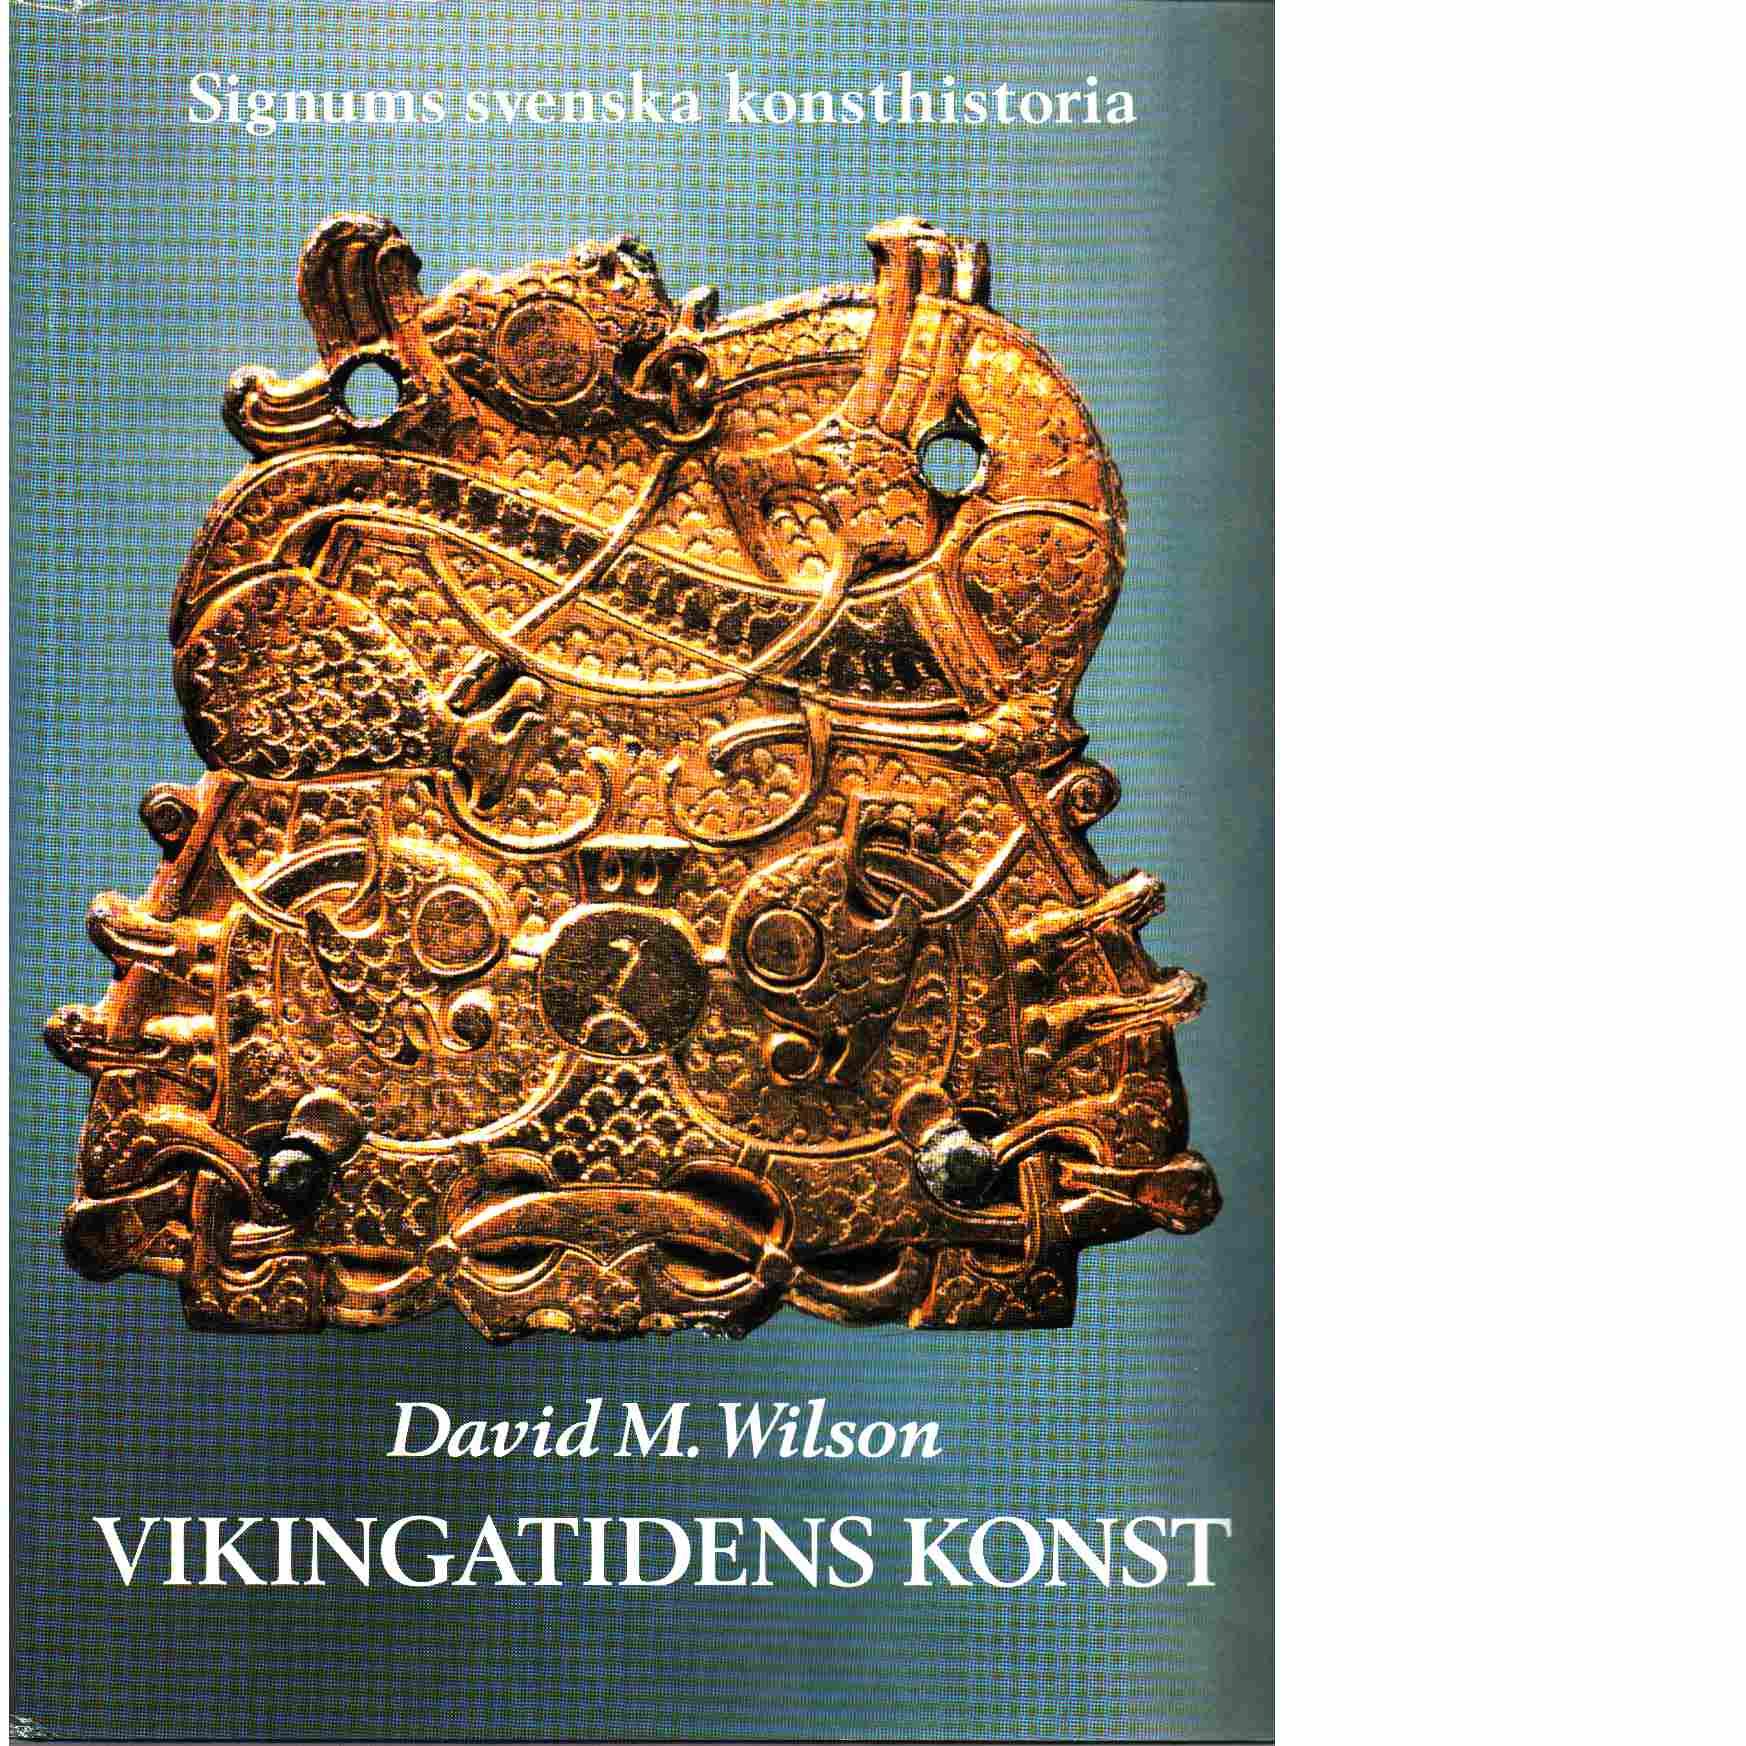 Signums svenska konsthistoria. [Bd 2], Vikingatidens konst - Wilson, David M.